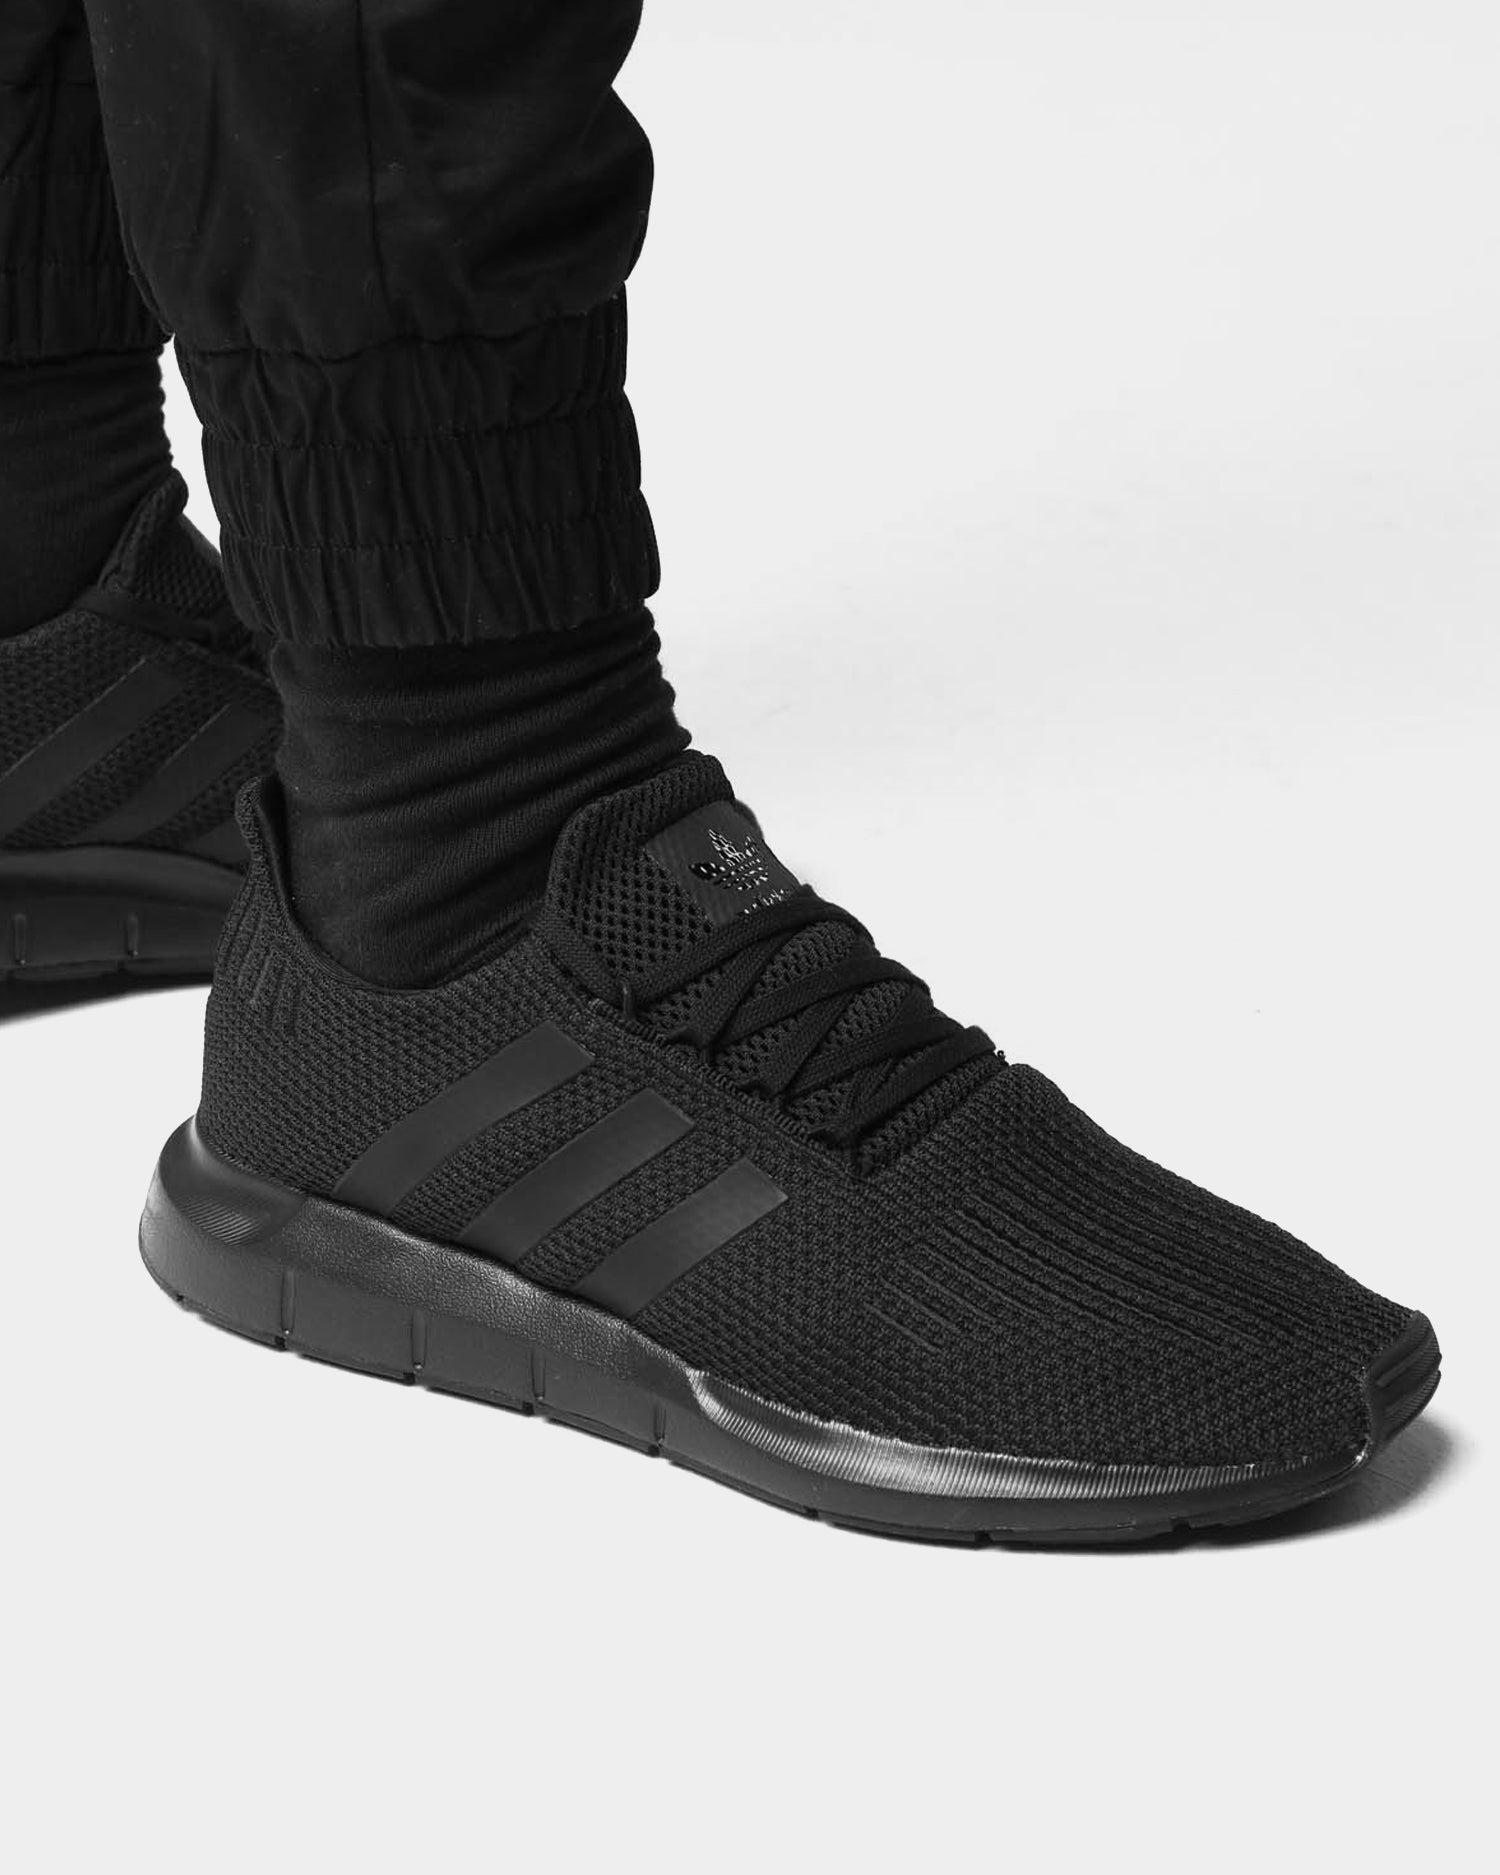 Adidas Swift Run Black/Black | Culture